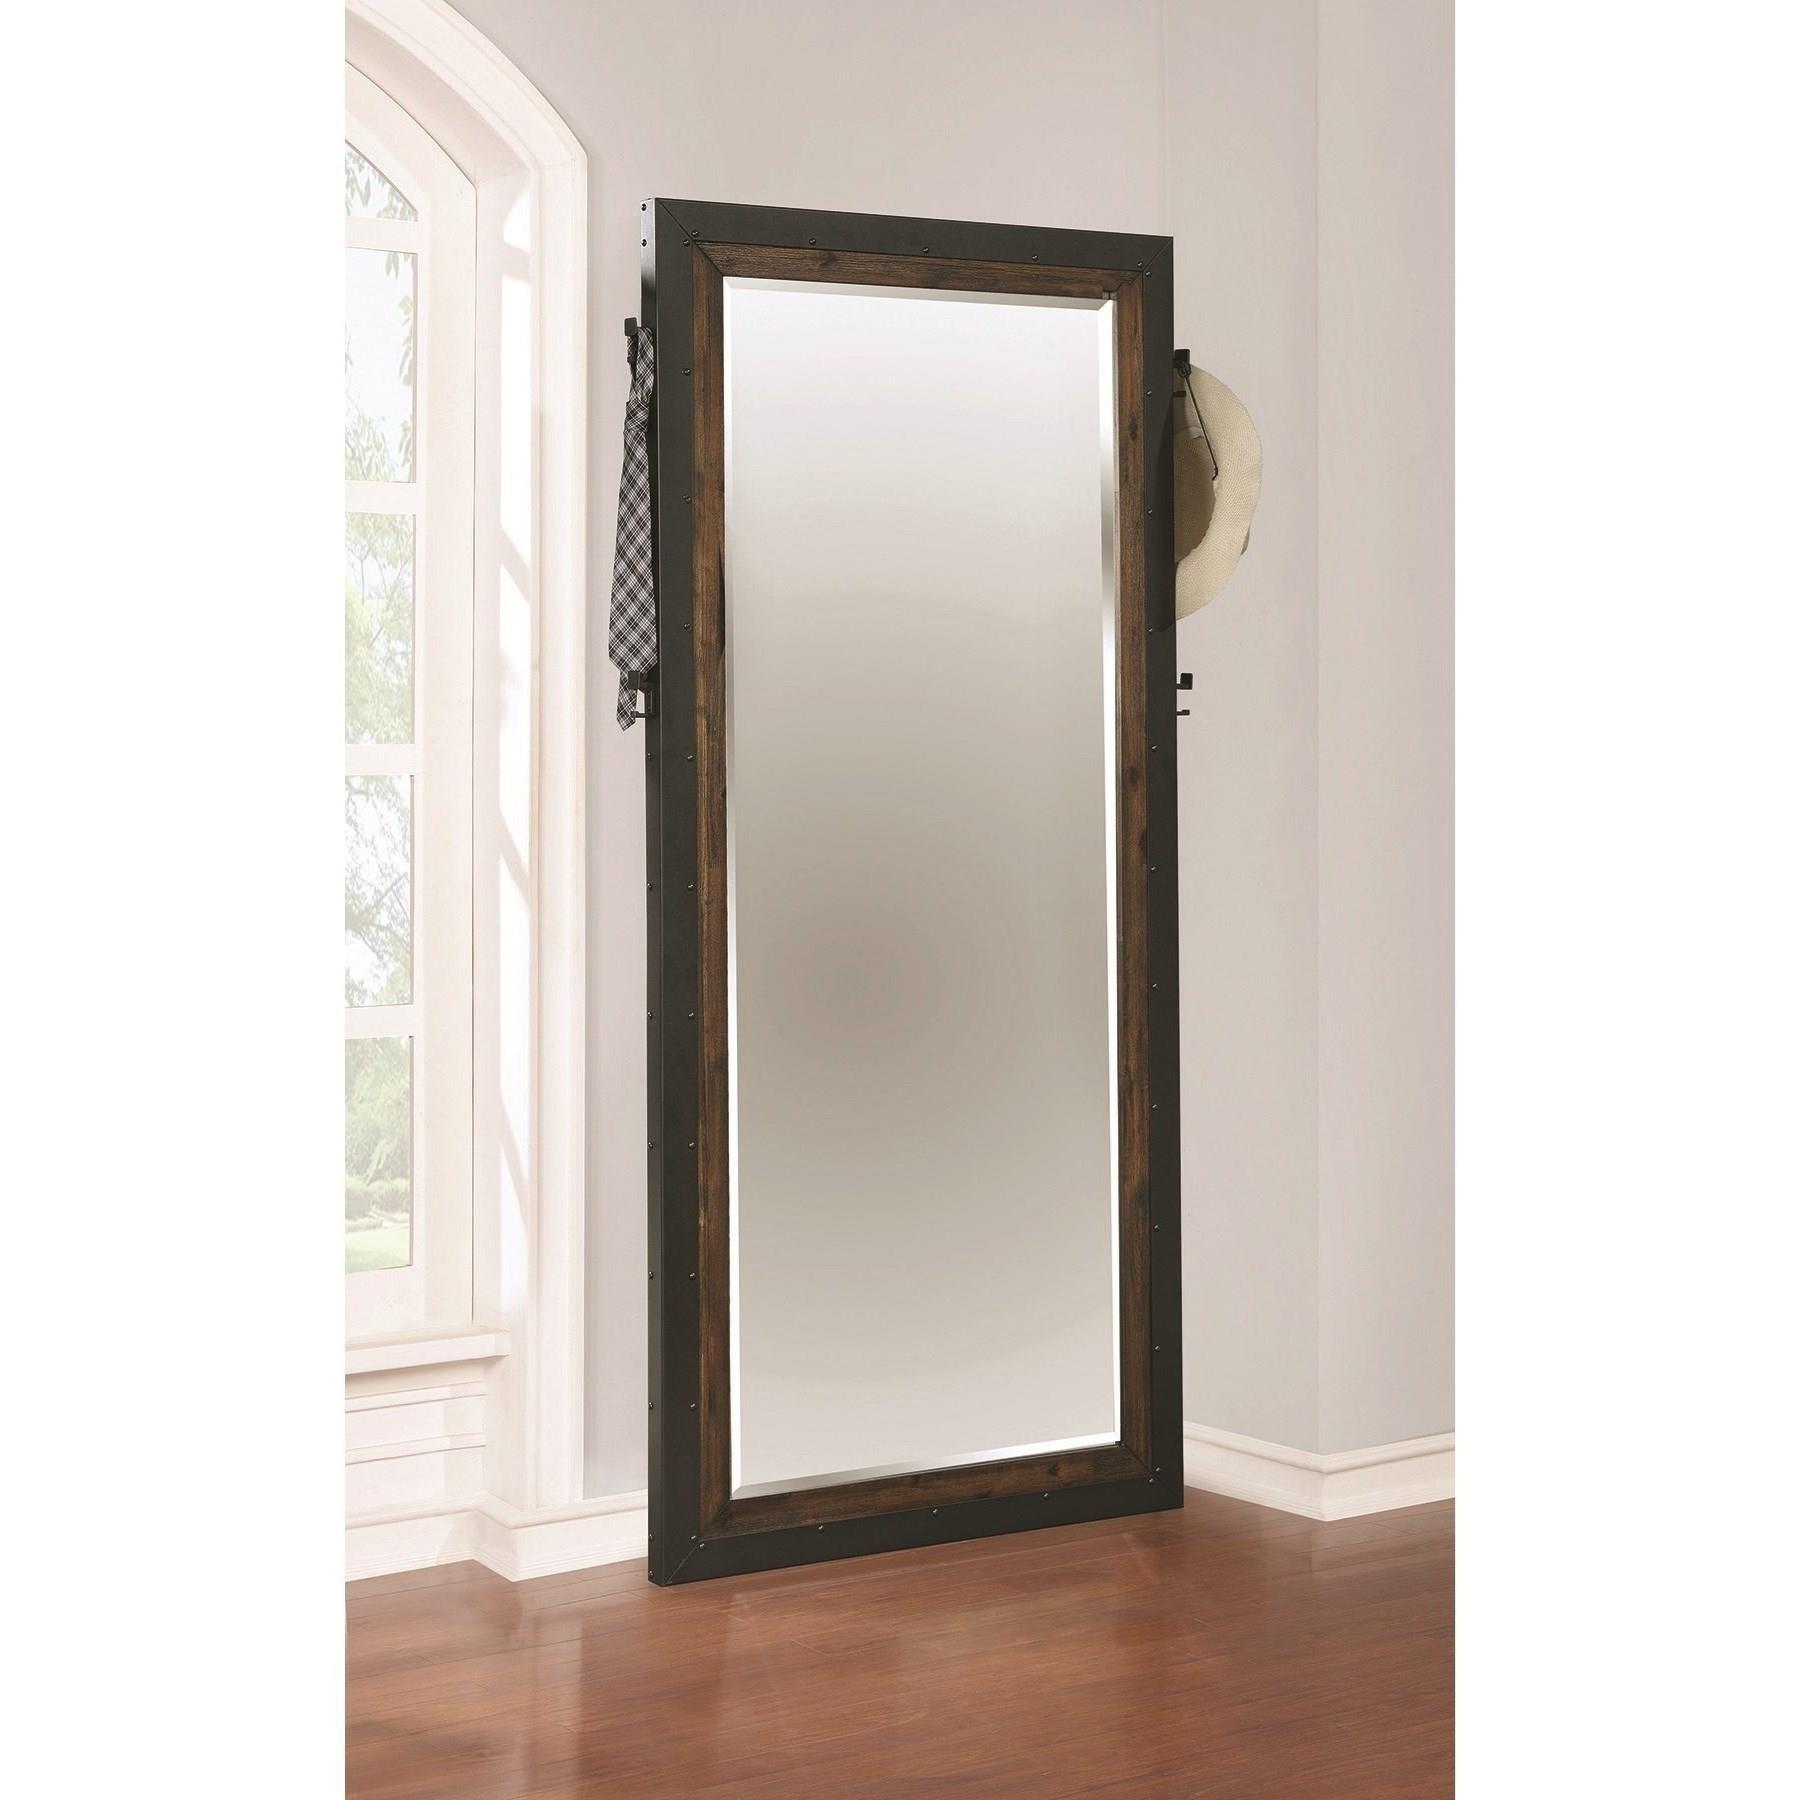 Ellison Industrial Floor Mirror With Metal Frame Quality